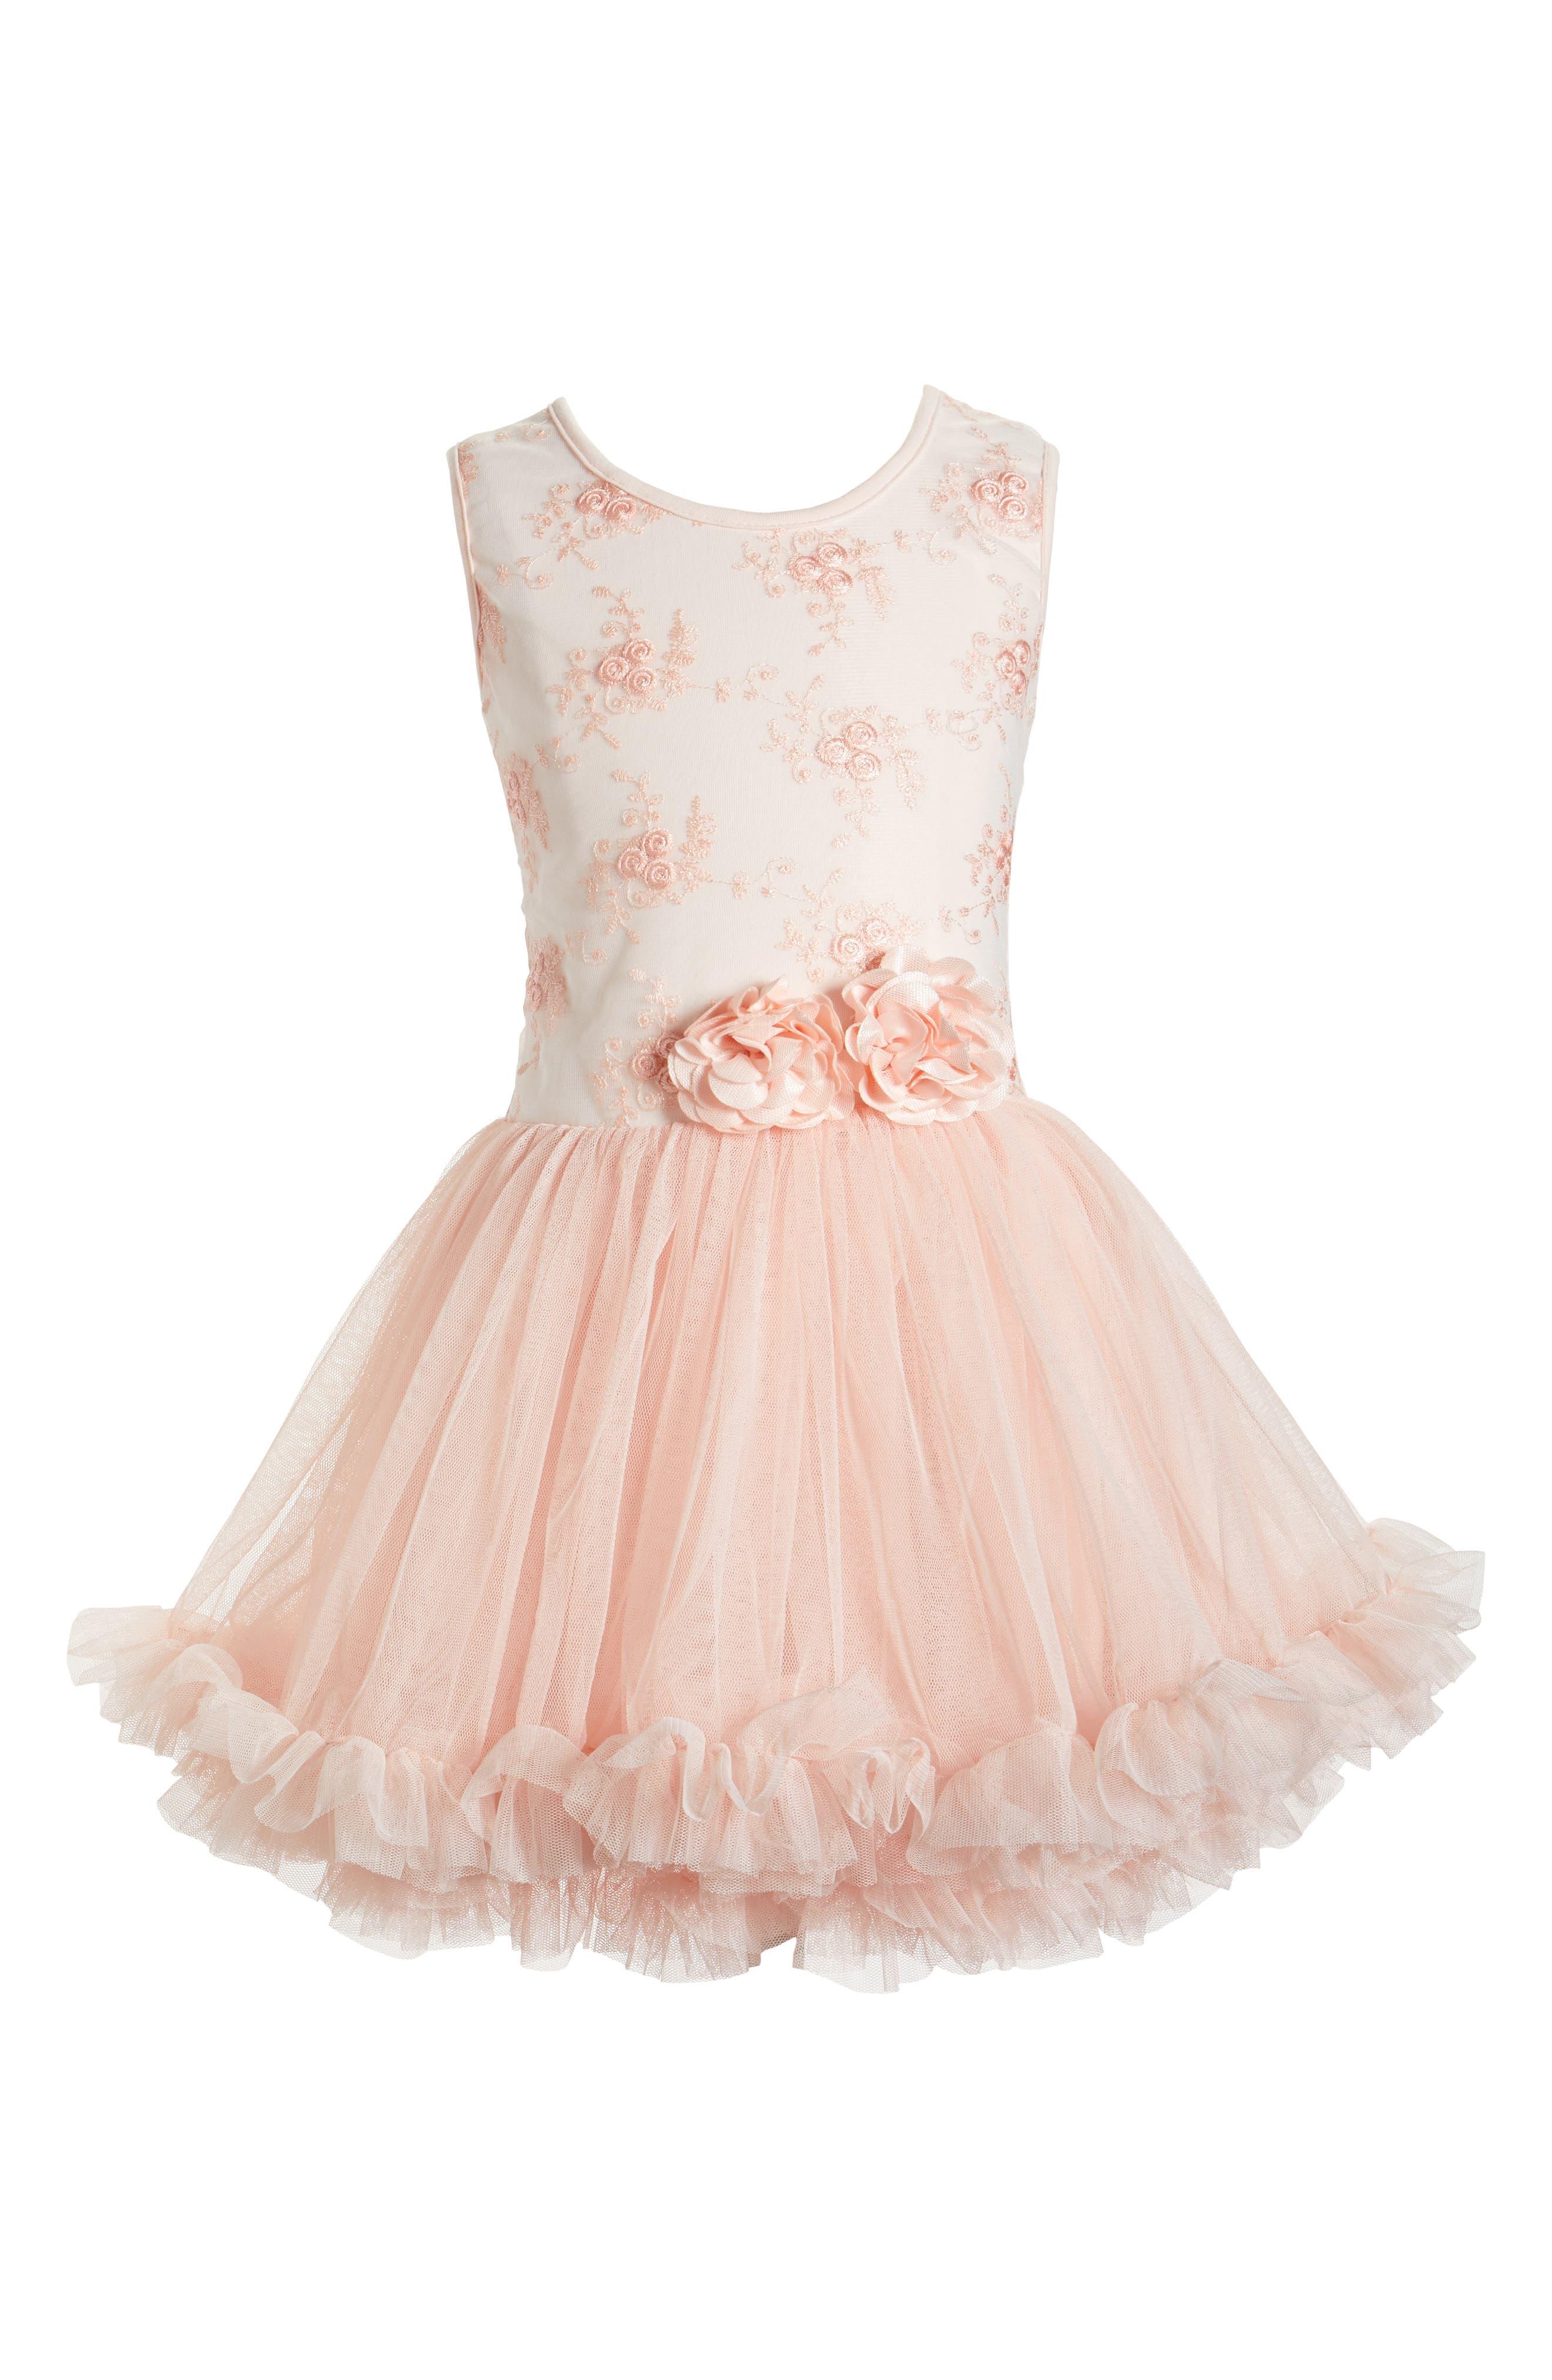 Alternate Image 1 Selected - Popatu Sleeveless Floral Dress (Toddler Girls & Little Girls)